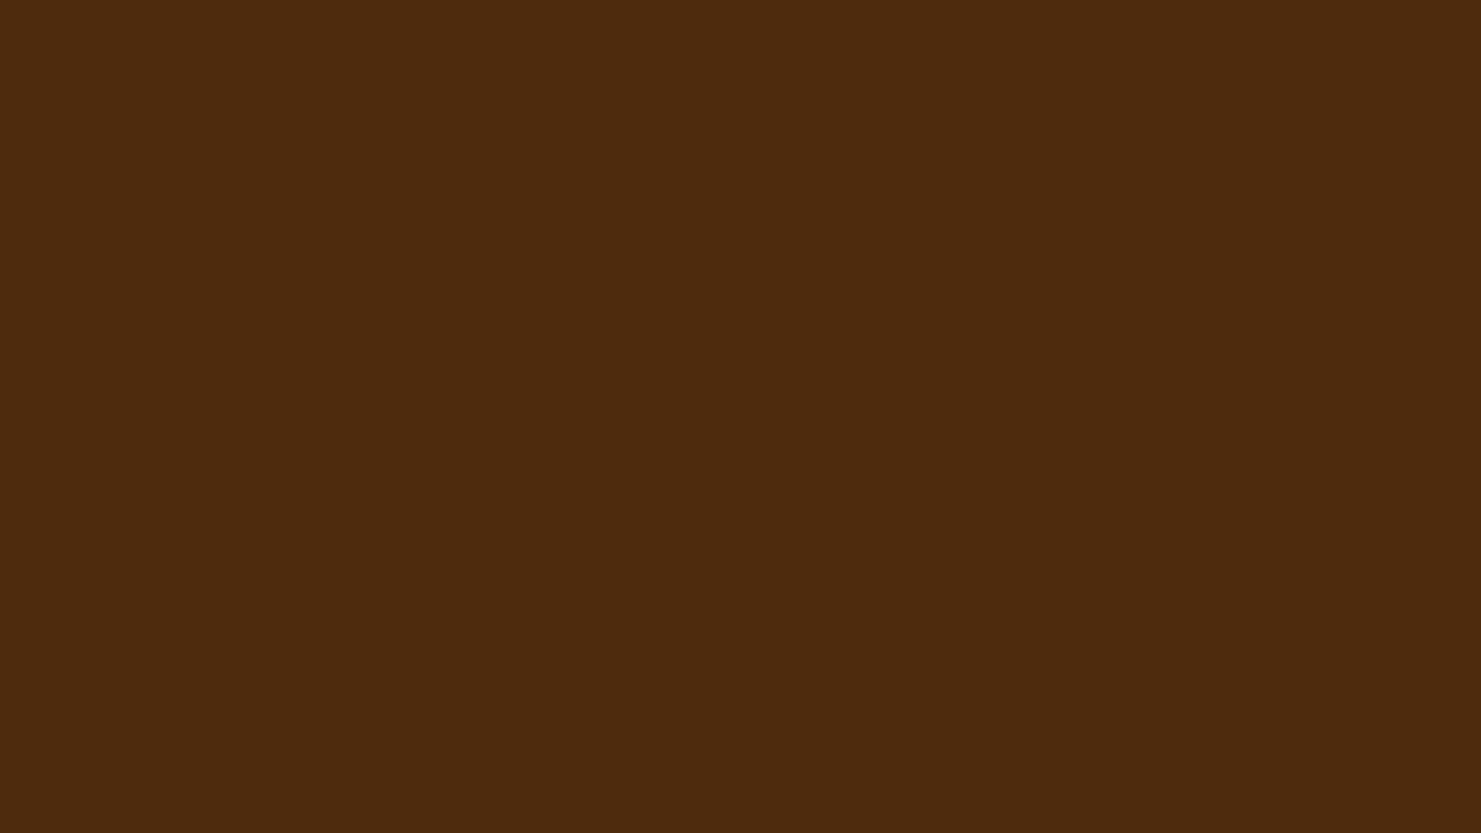 Copy of Dark Brown Minimalist Modern Laptop Mockup Shades of Autumn Instagram Story.png